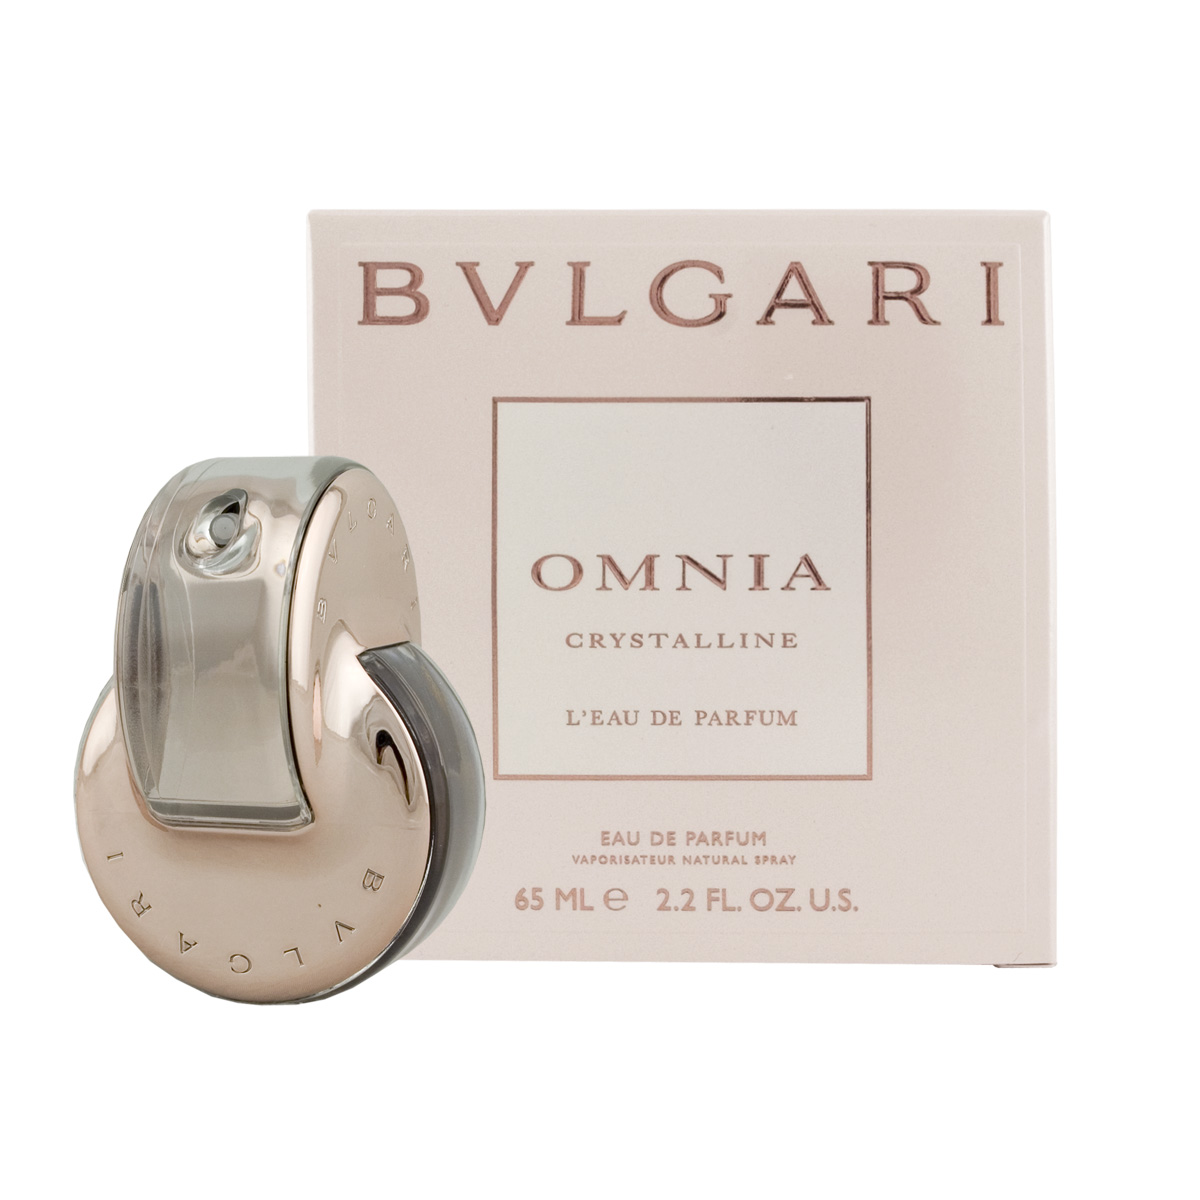 Bvlgari Omnia Crystalline L'Eau de Parfum EDP 65 ml W